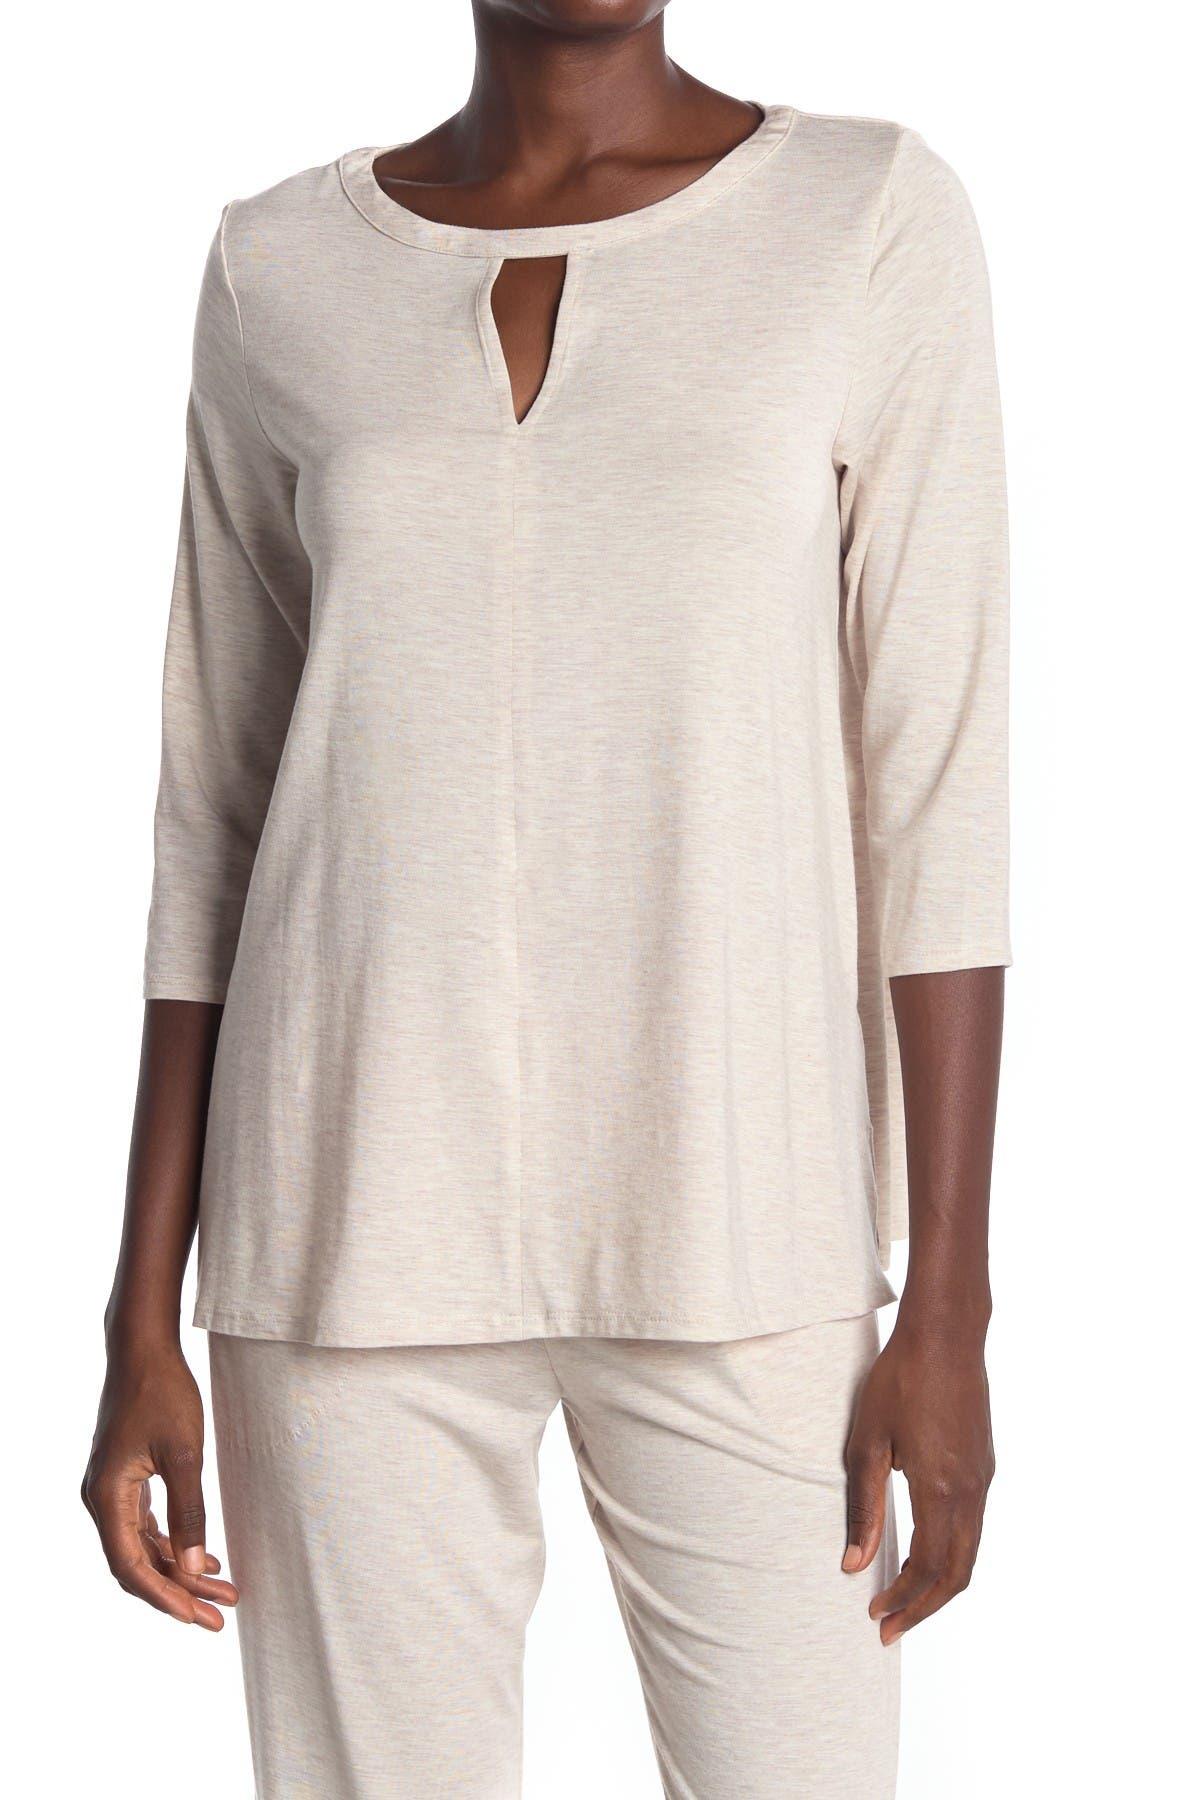 Image of Donna Karan Heathered Keyhole 3/4 Sleeve Pajama Top